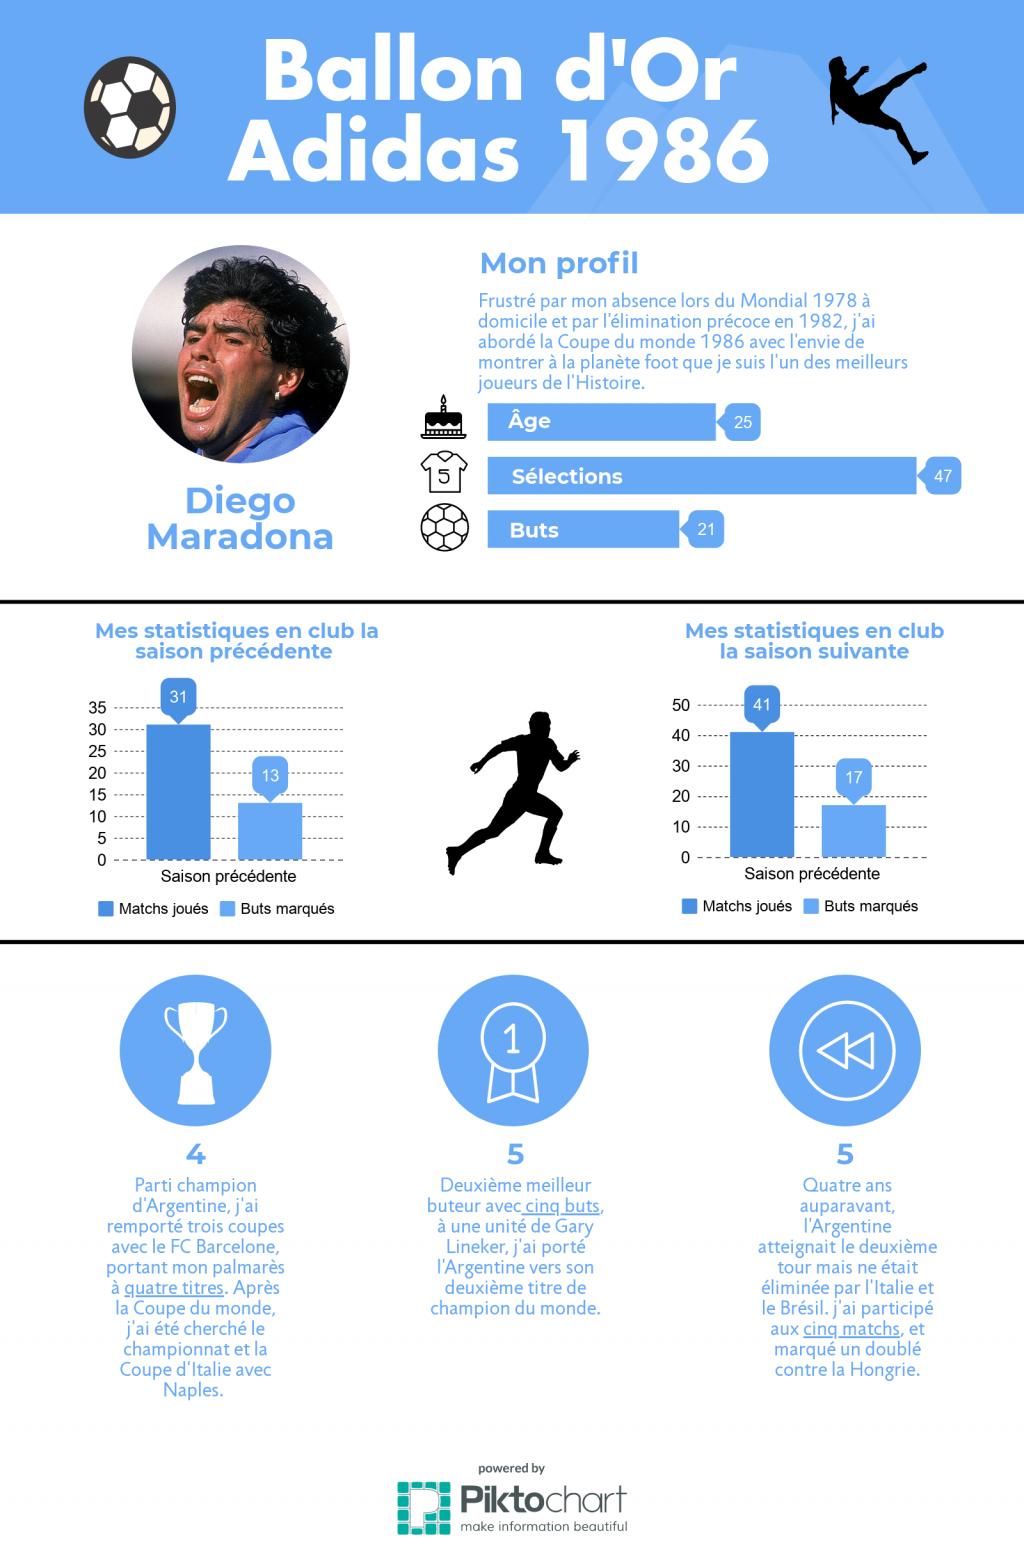 diego-maradona-1986-ballon-dor-adidas-foot-dinfographies